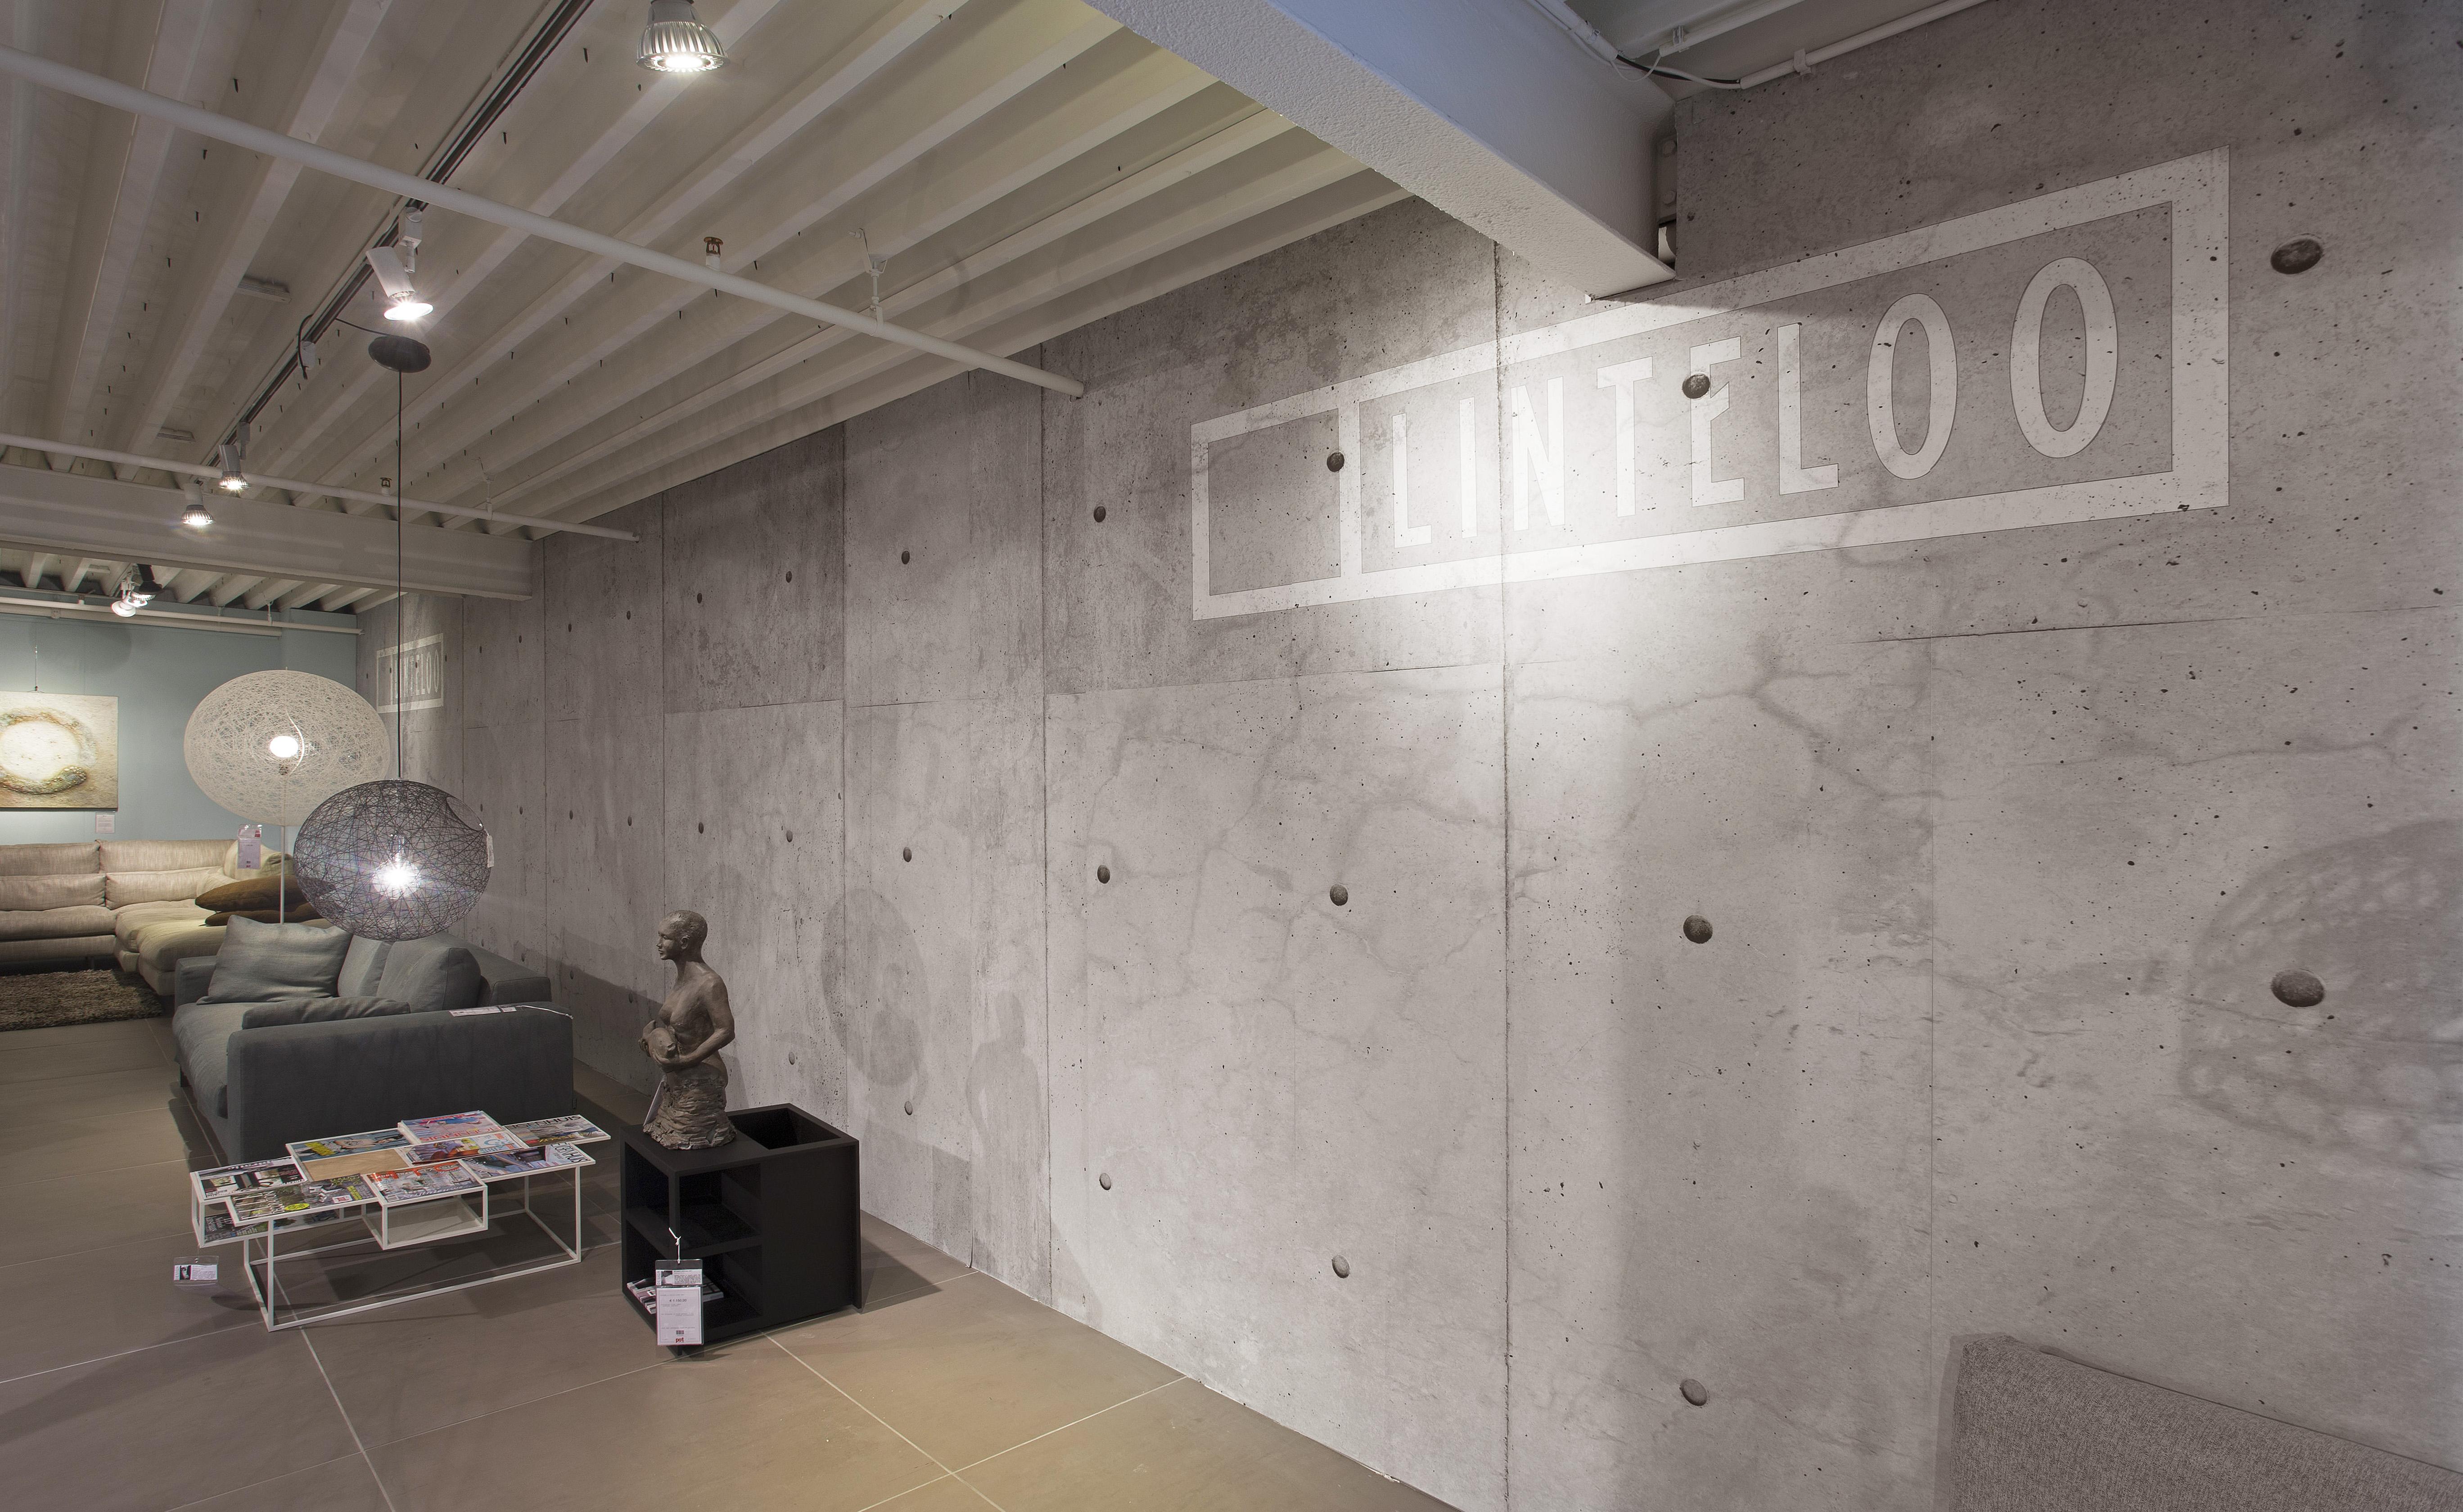 Vliesbehang Linteloo 1 - Bronvermelding - Berden Meubelen - showroom Pot Interieur Axel.jpg